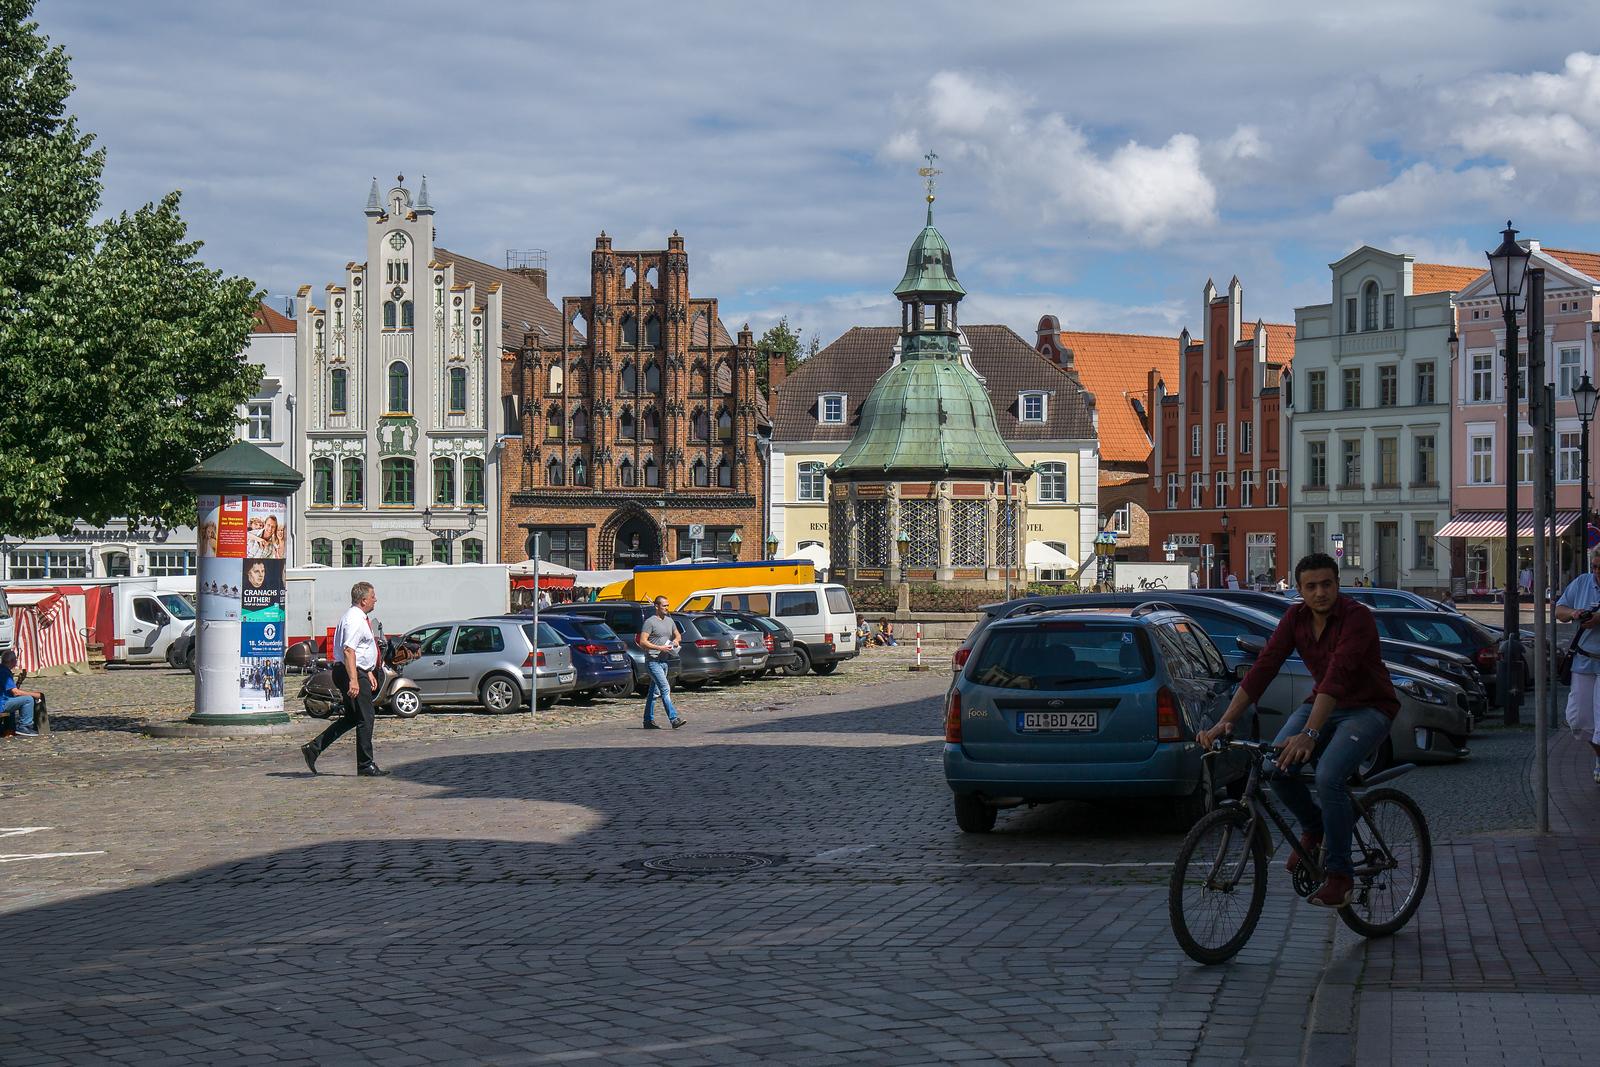 Marktplatz i Wismar jpg